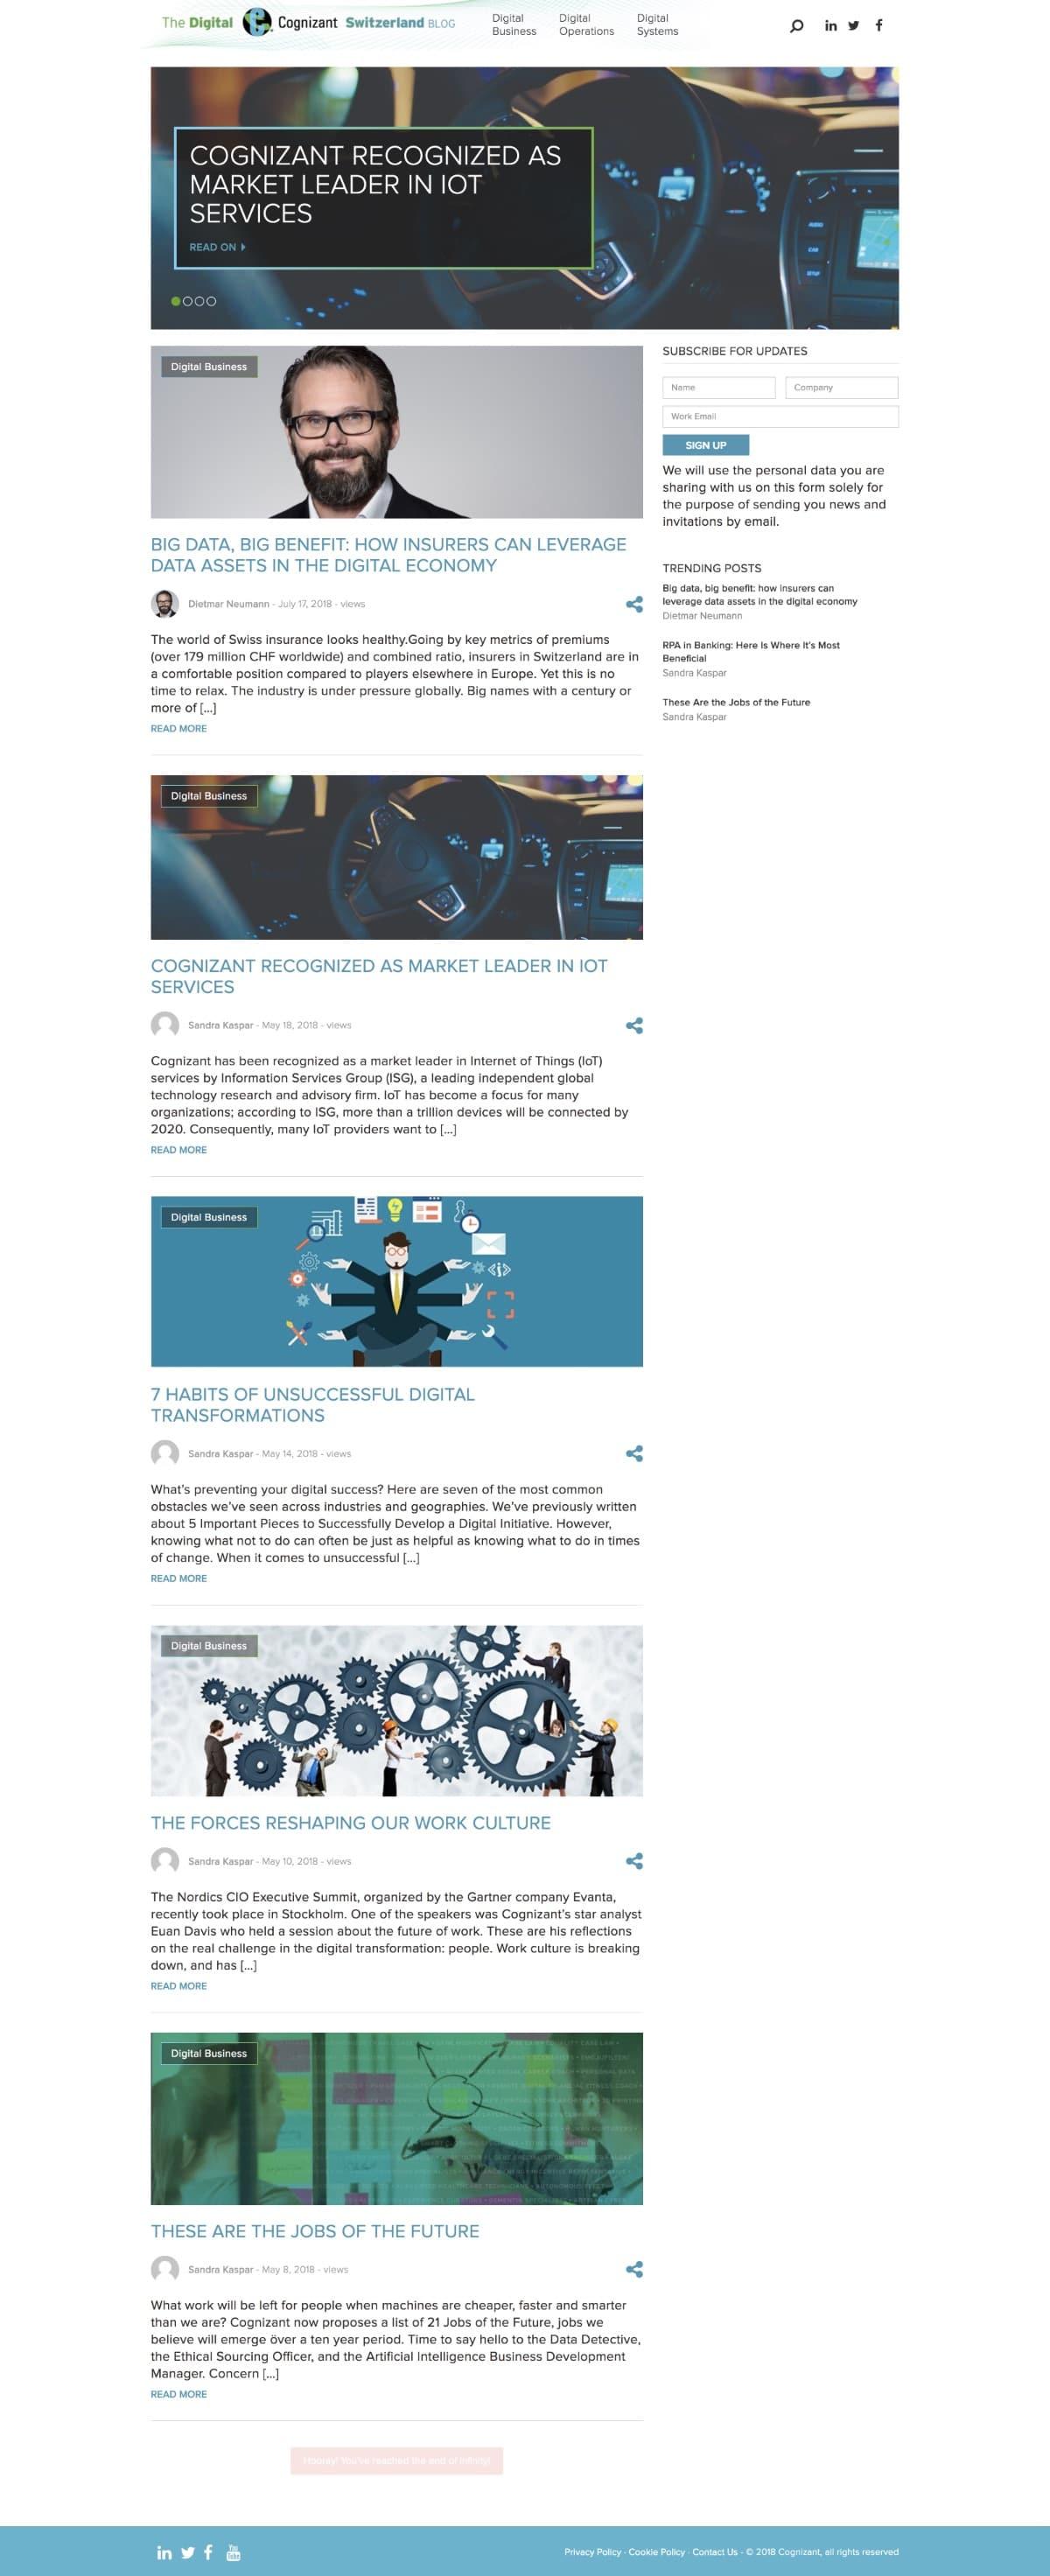 The Digital Cognizant Switzerland Blog